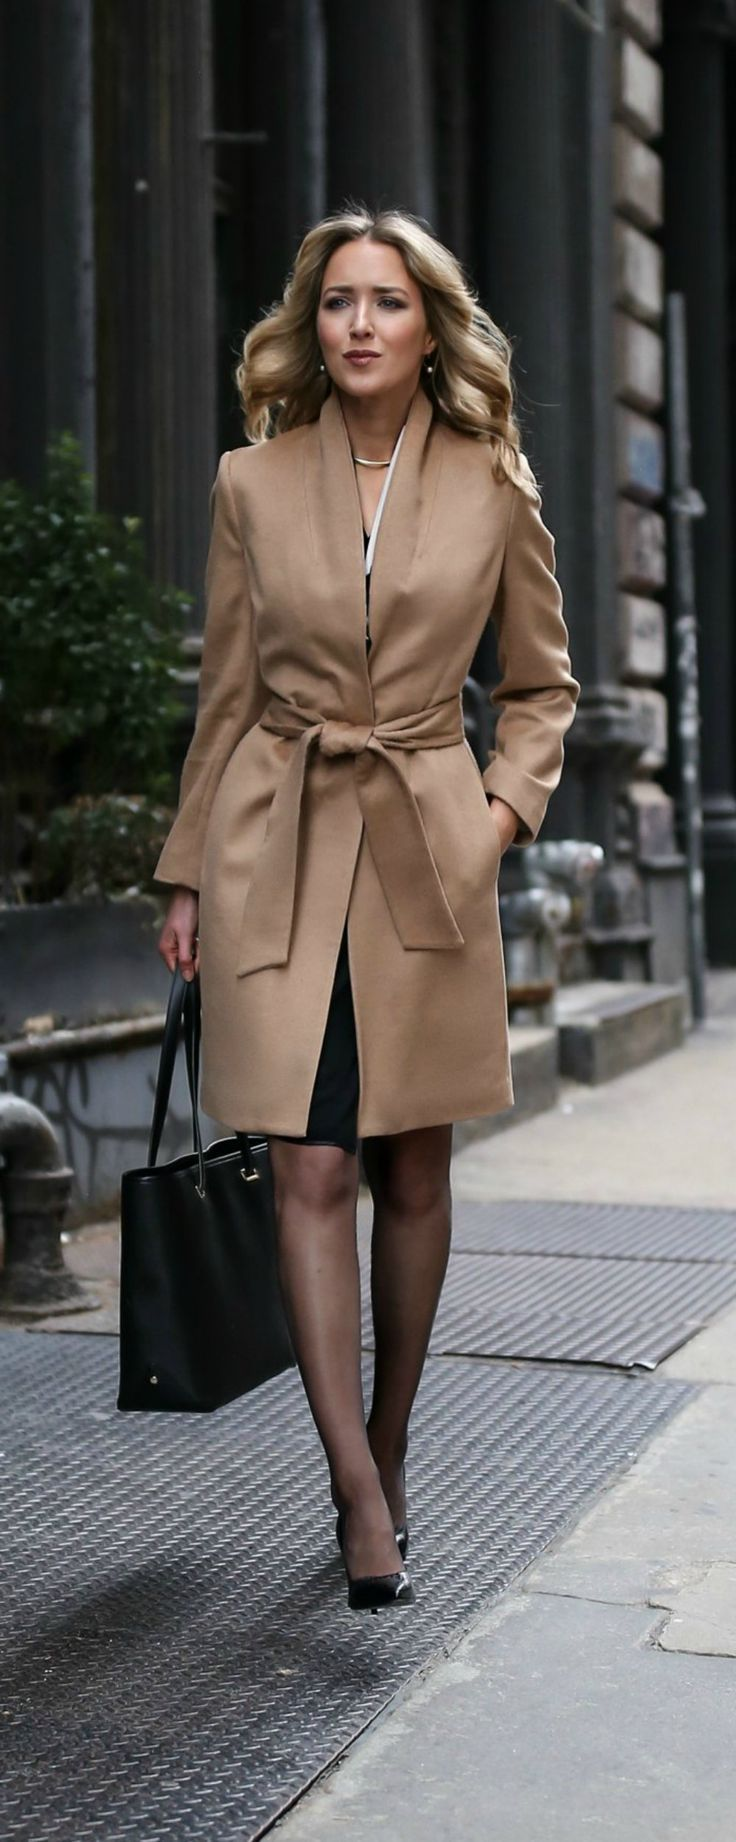 camel tie waist classic wool coat, black faux wrap front v-neck short sleeve sheath dress, sheer black tights, timeless black pointed toe pumps, gold choker necklace, work tote bag | /mmlafleur/